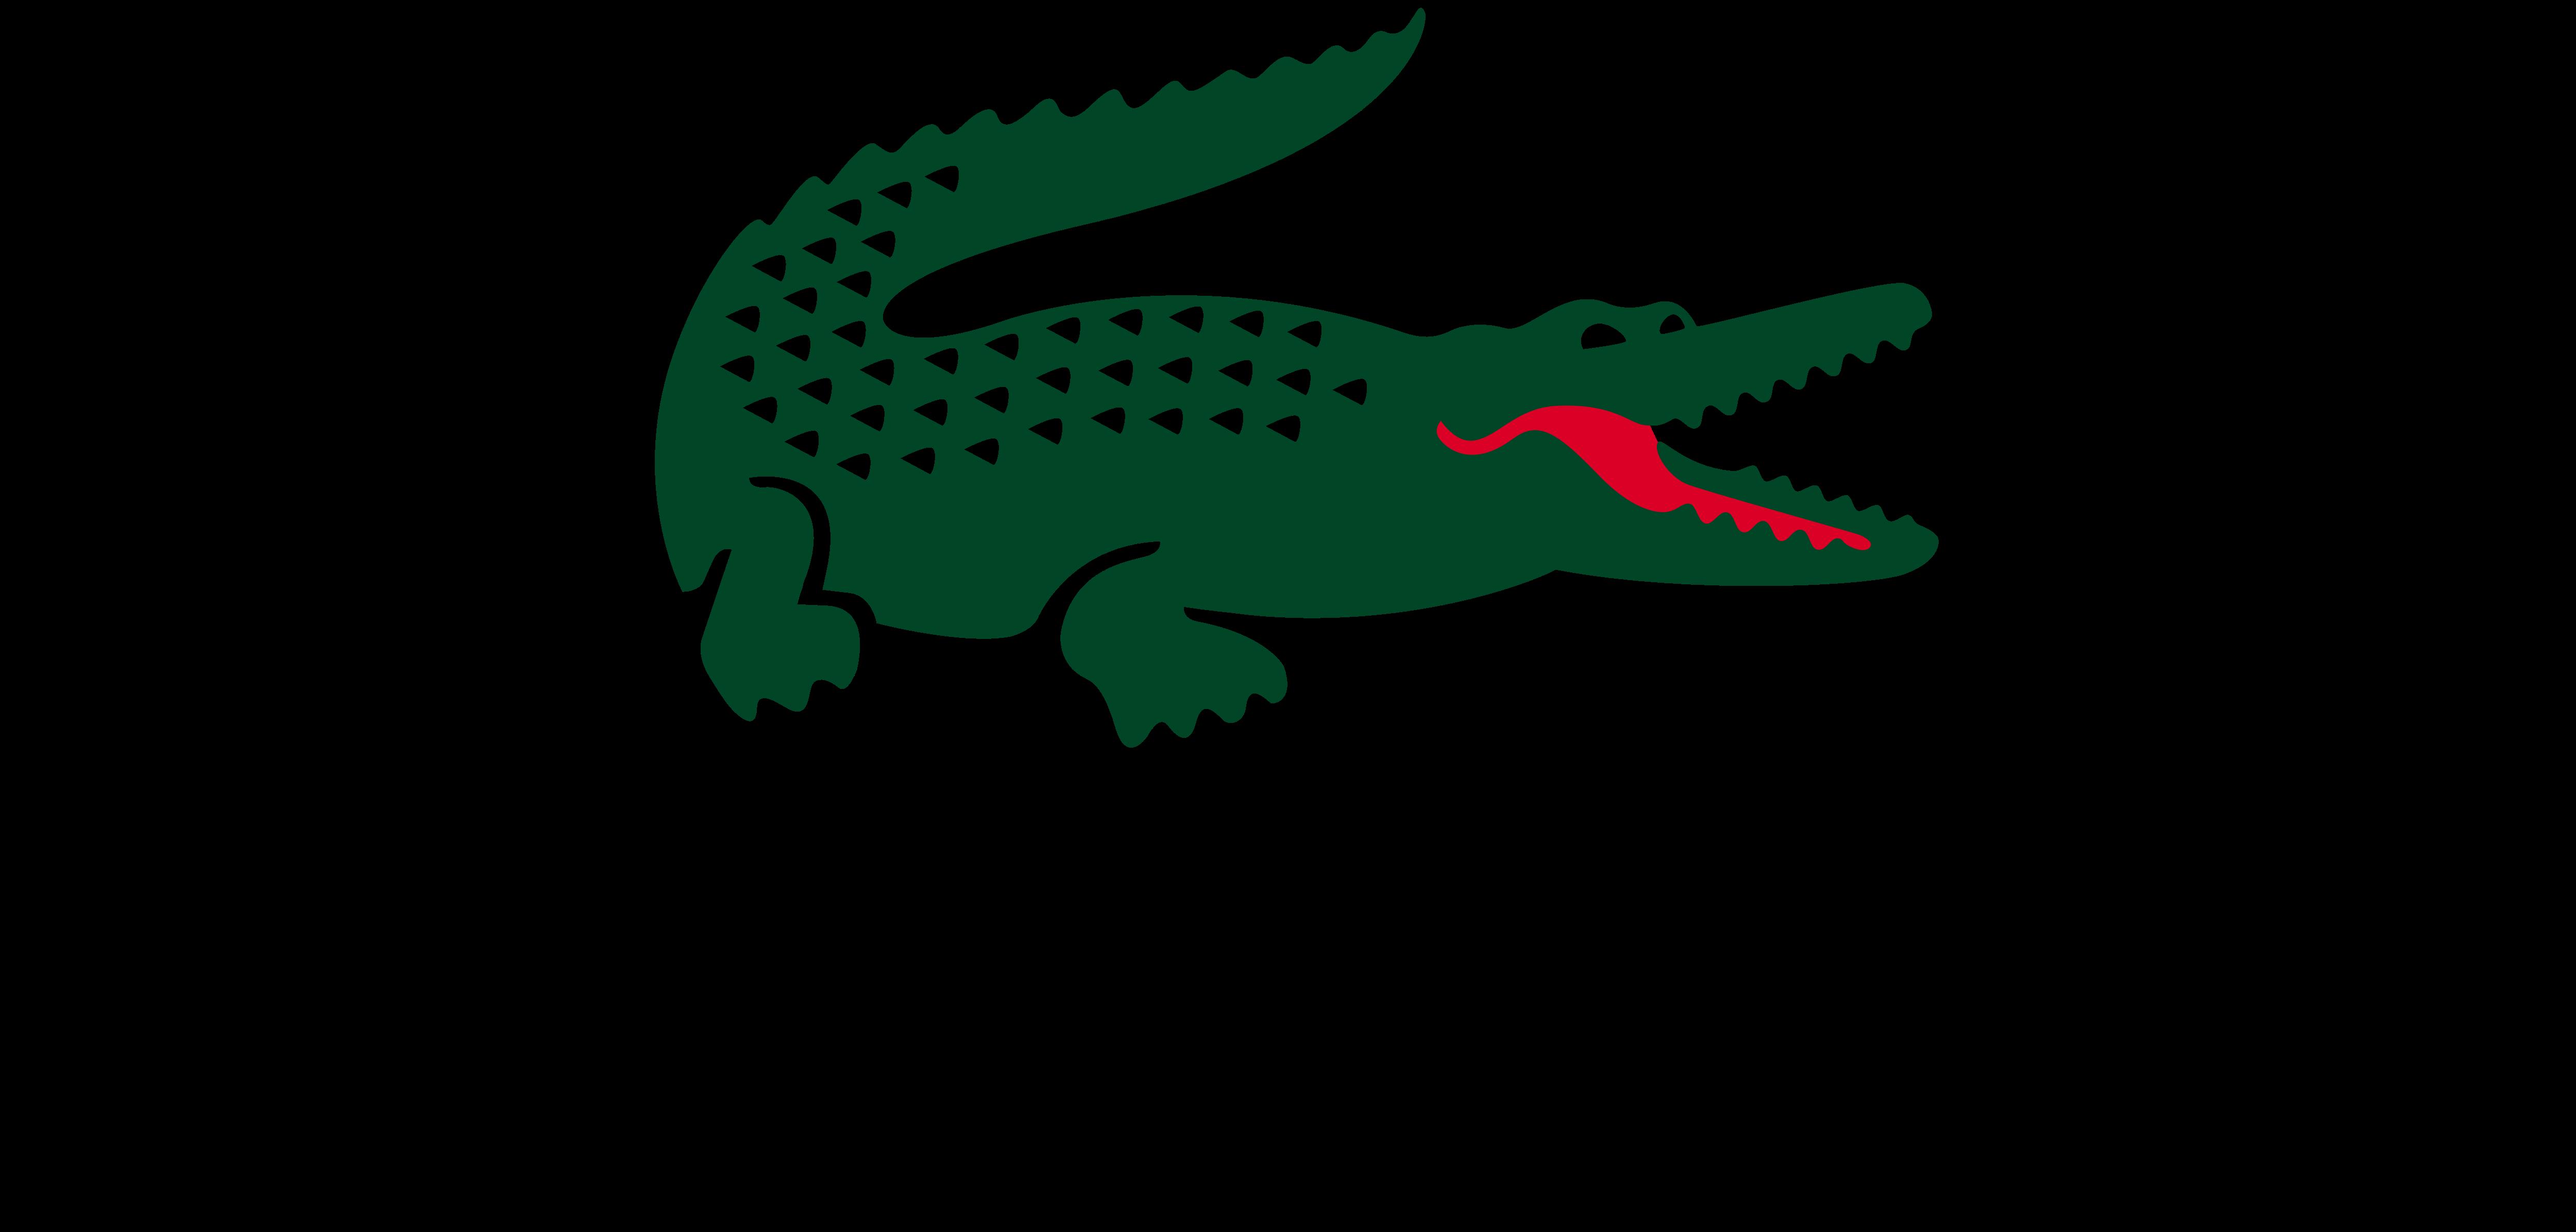 lacoste � logos download